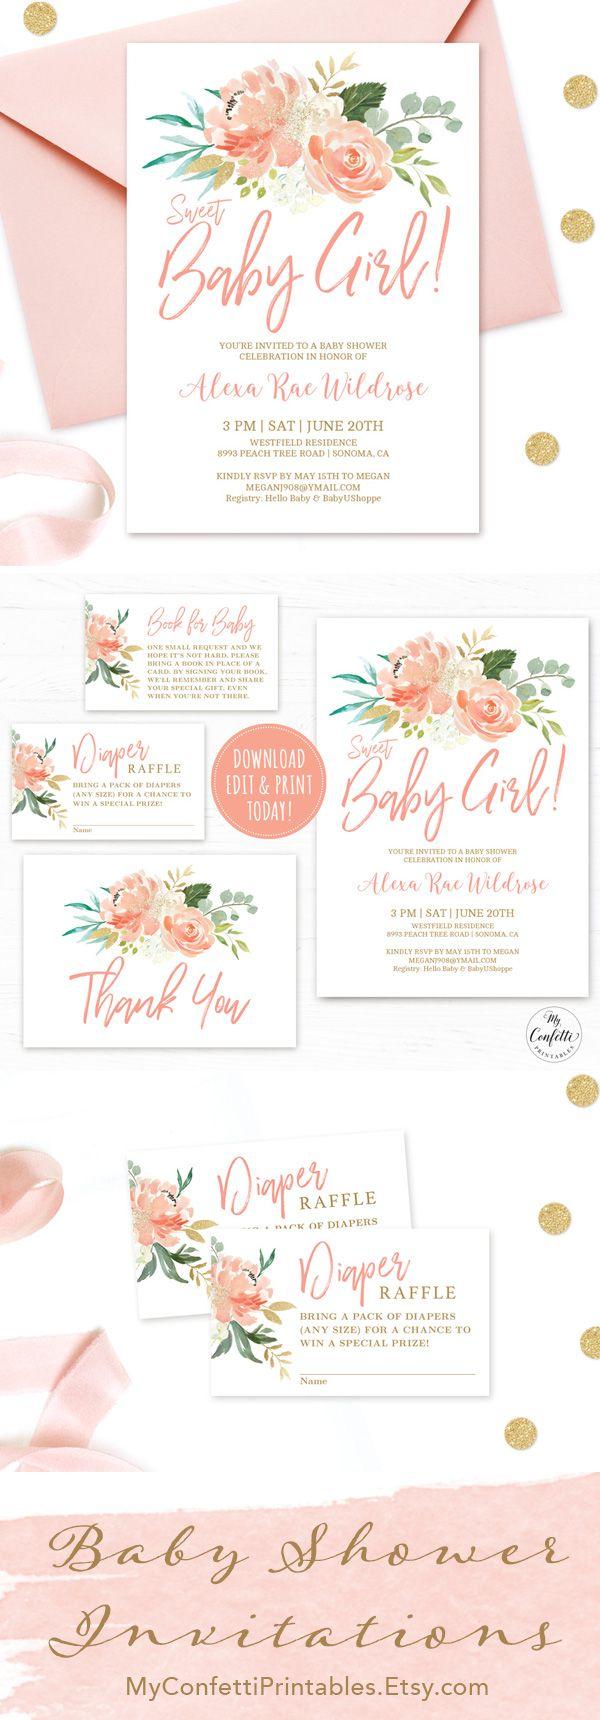 EDITABLE Girl Baby Shower Invitation Template, Printable Baby Shower Invitation Bundle, Peach Blush Floral, Boho, Sweet Baby Girl, MCP808